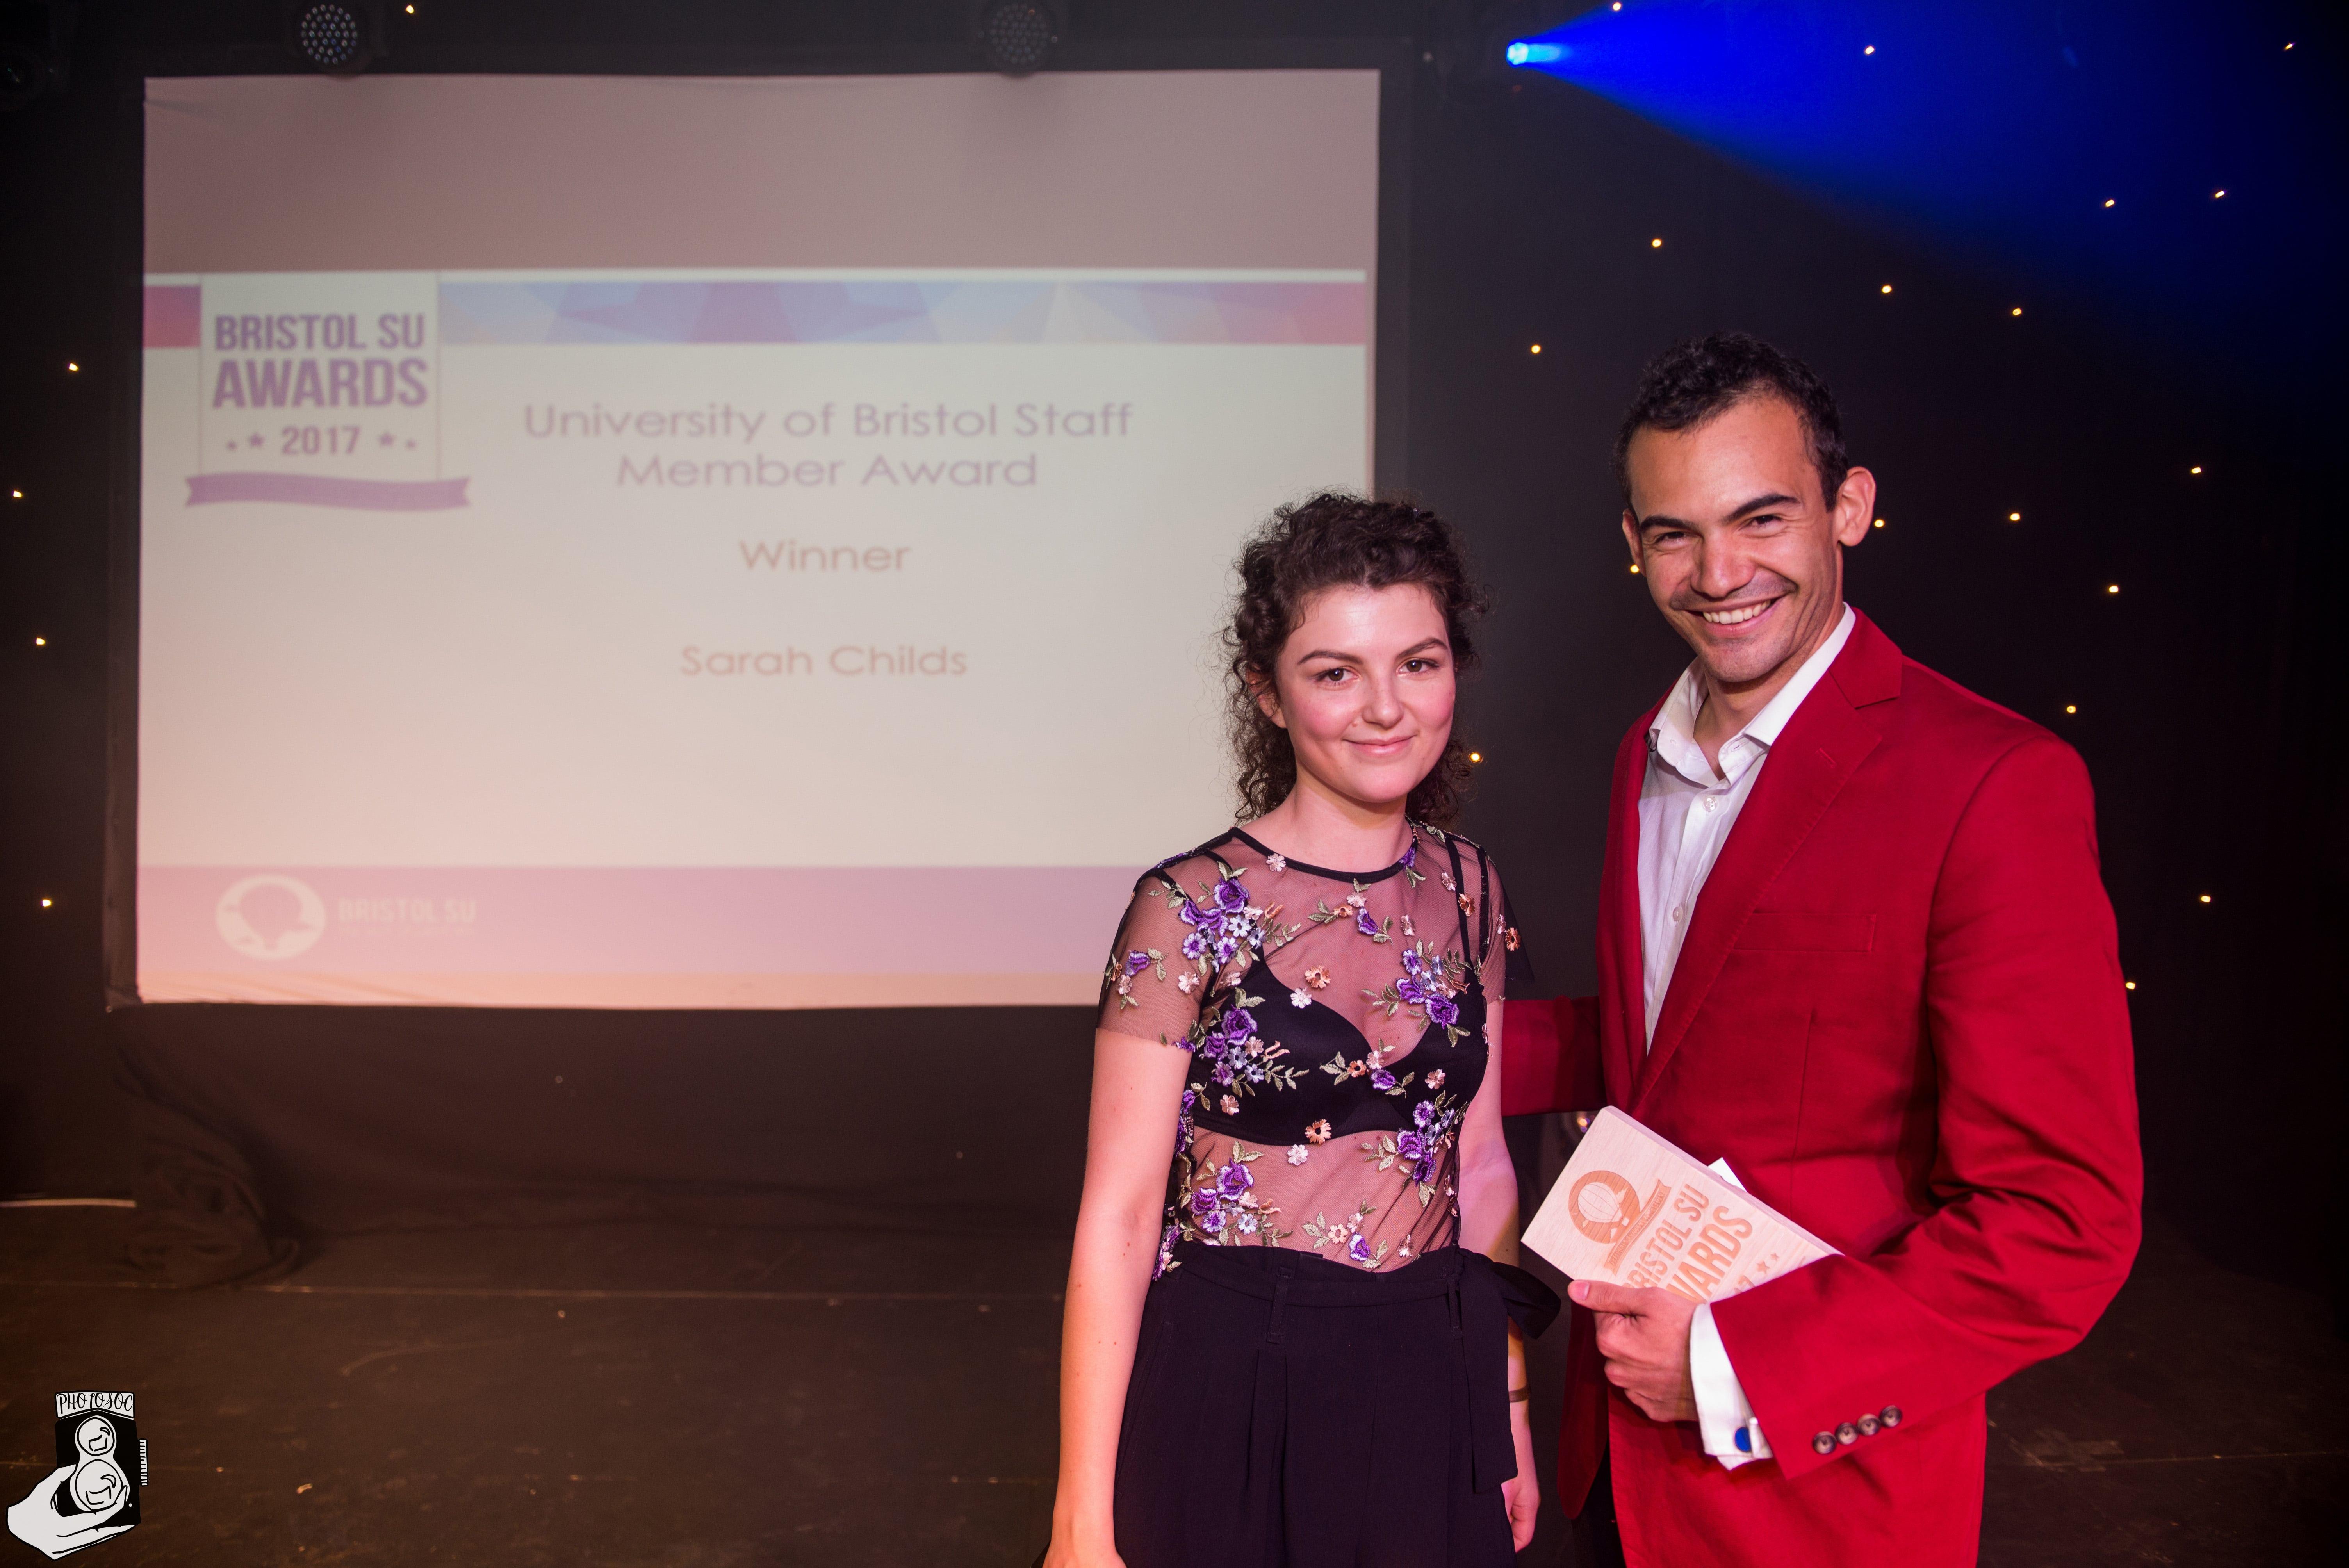 Sarah Childs winning University of Bristol staff member